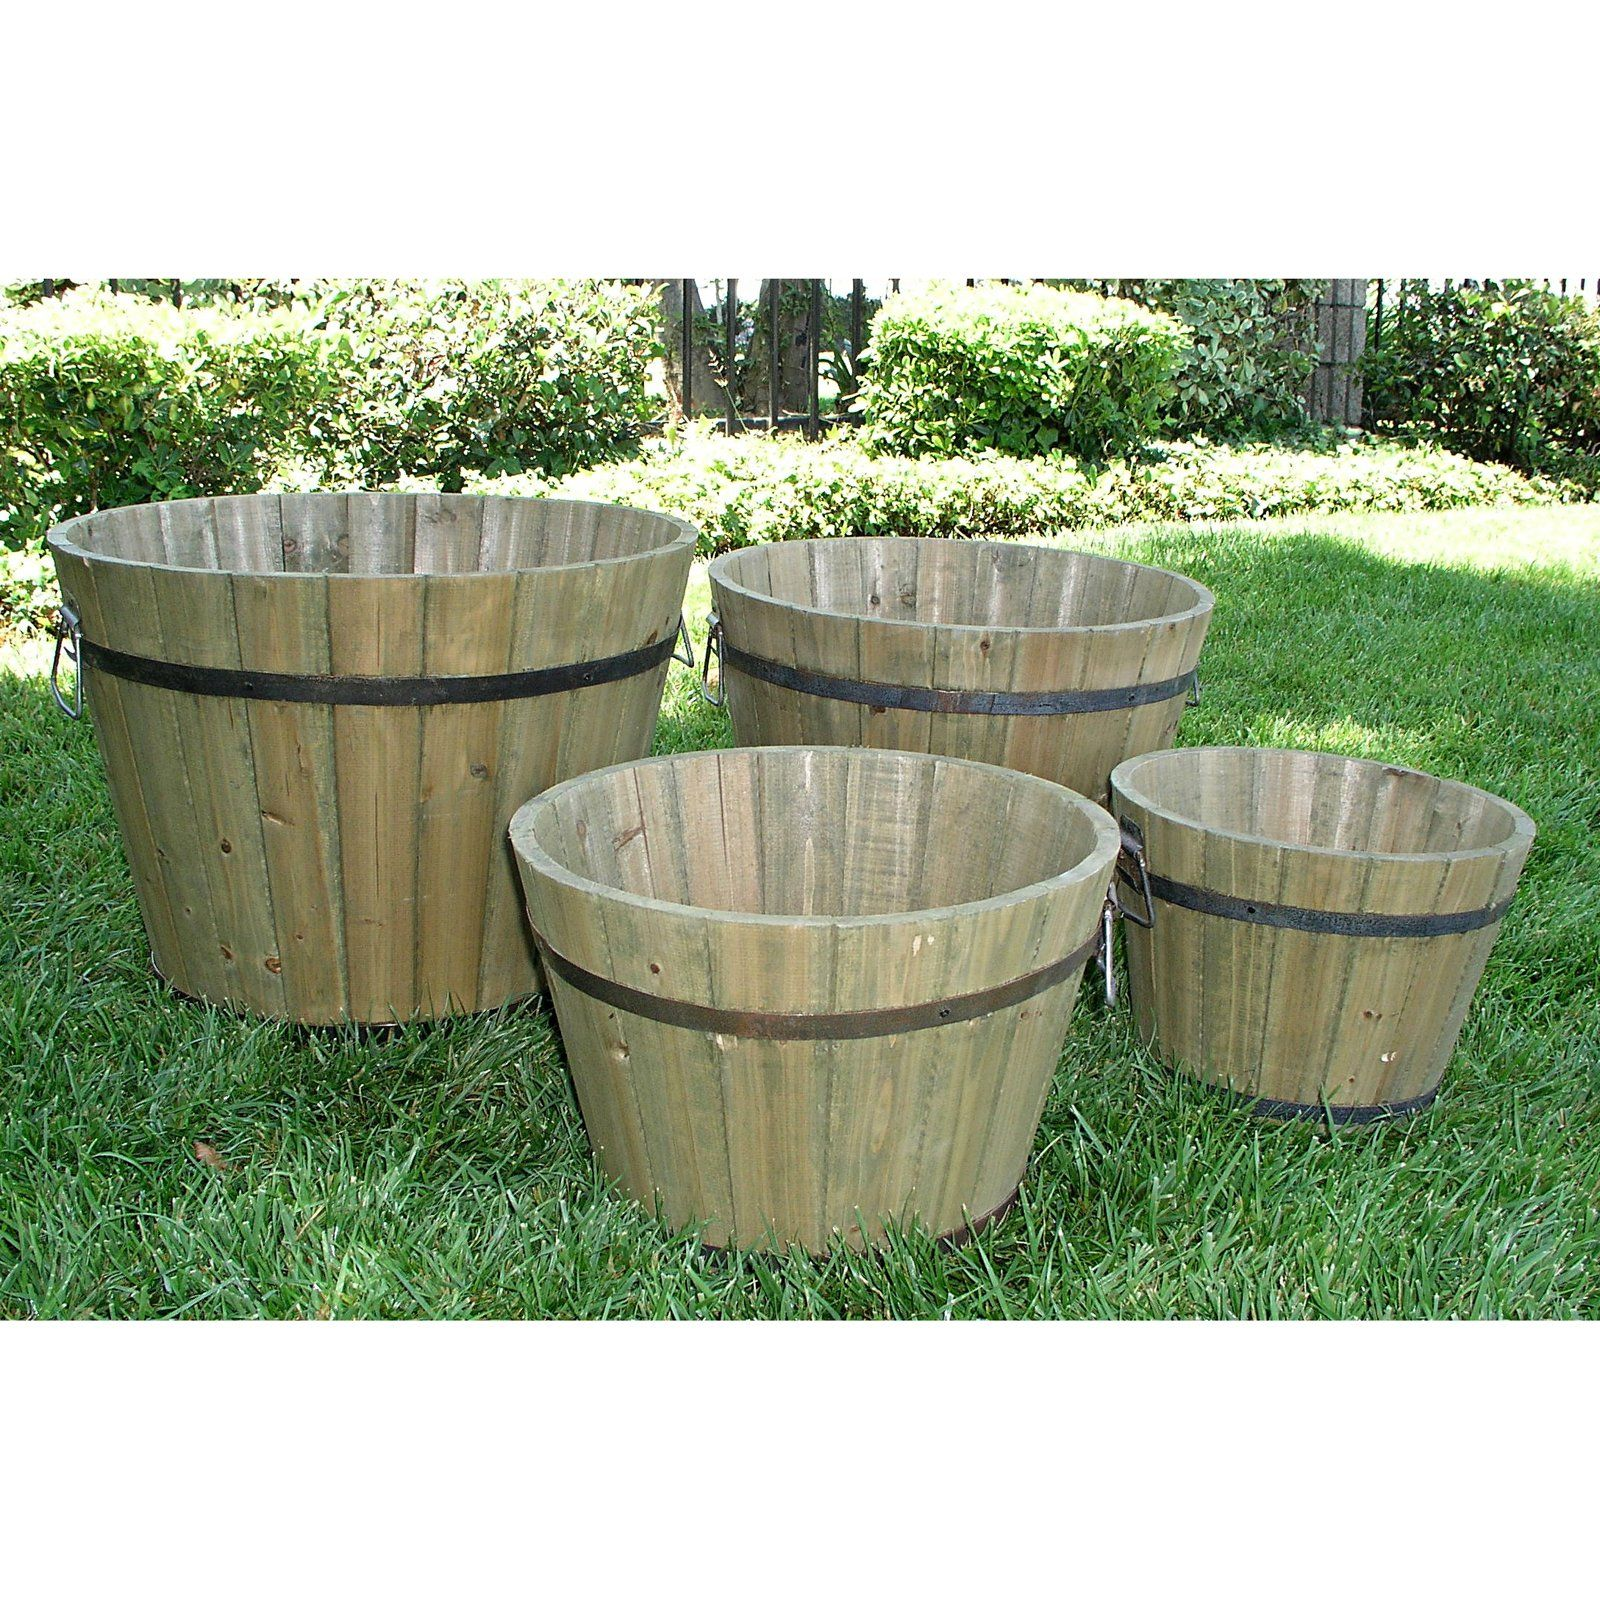 Shine Company Round Cedar Wood Bilbao Tall Barrel Planter - Set of 4